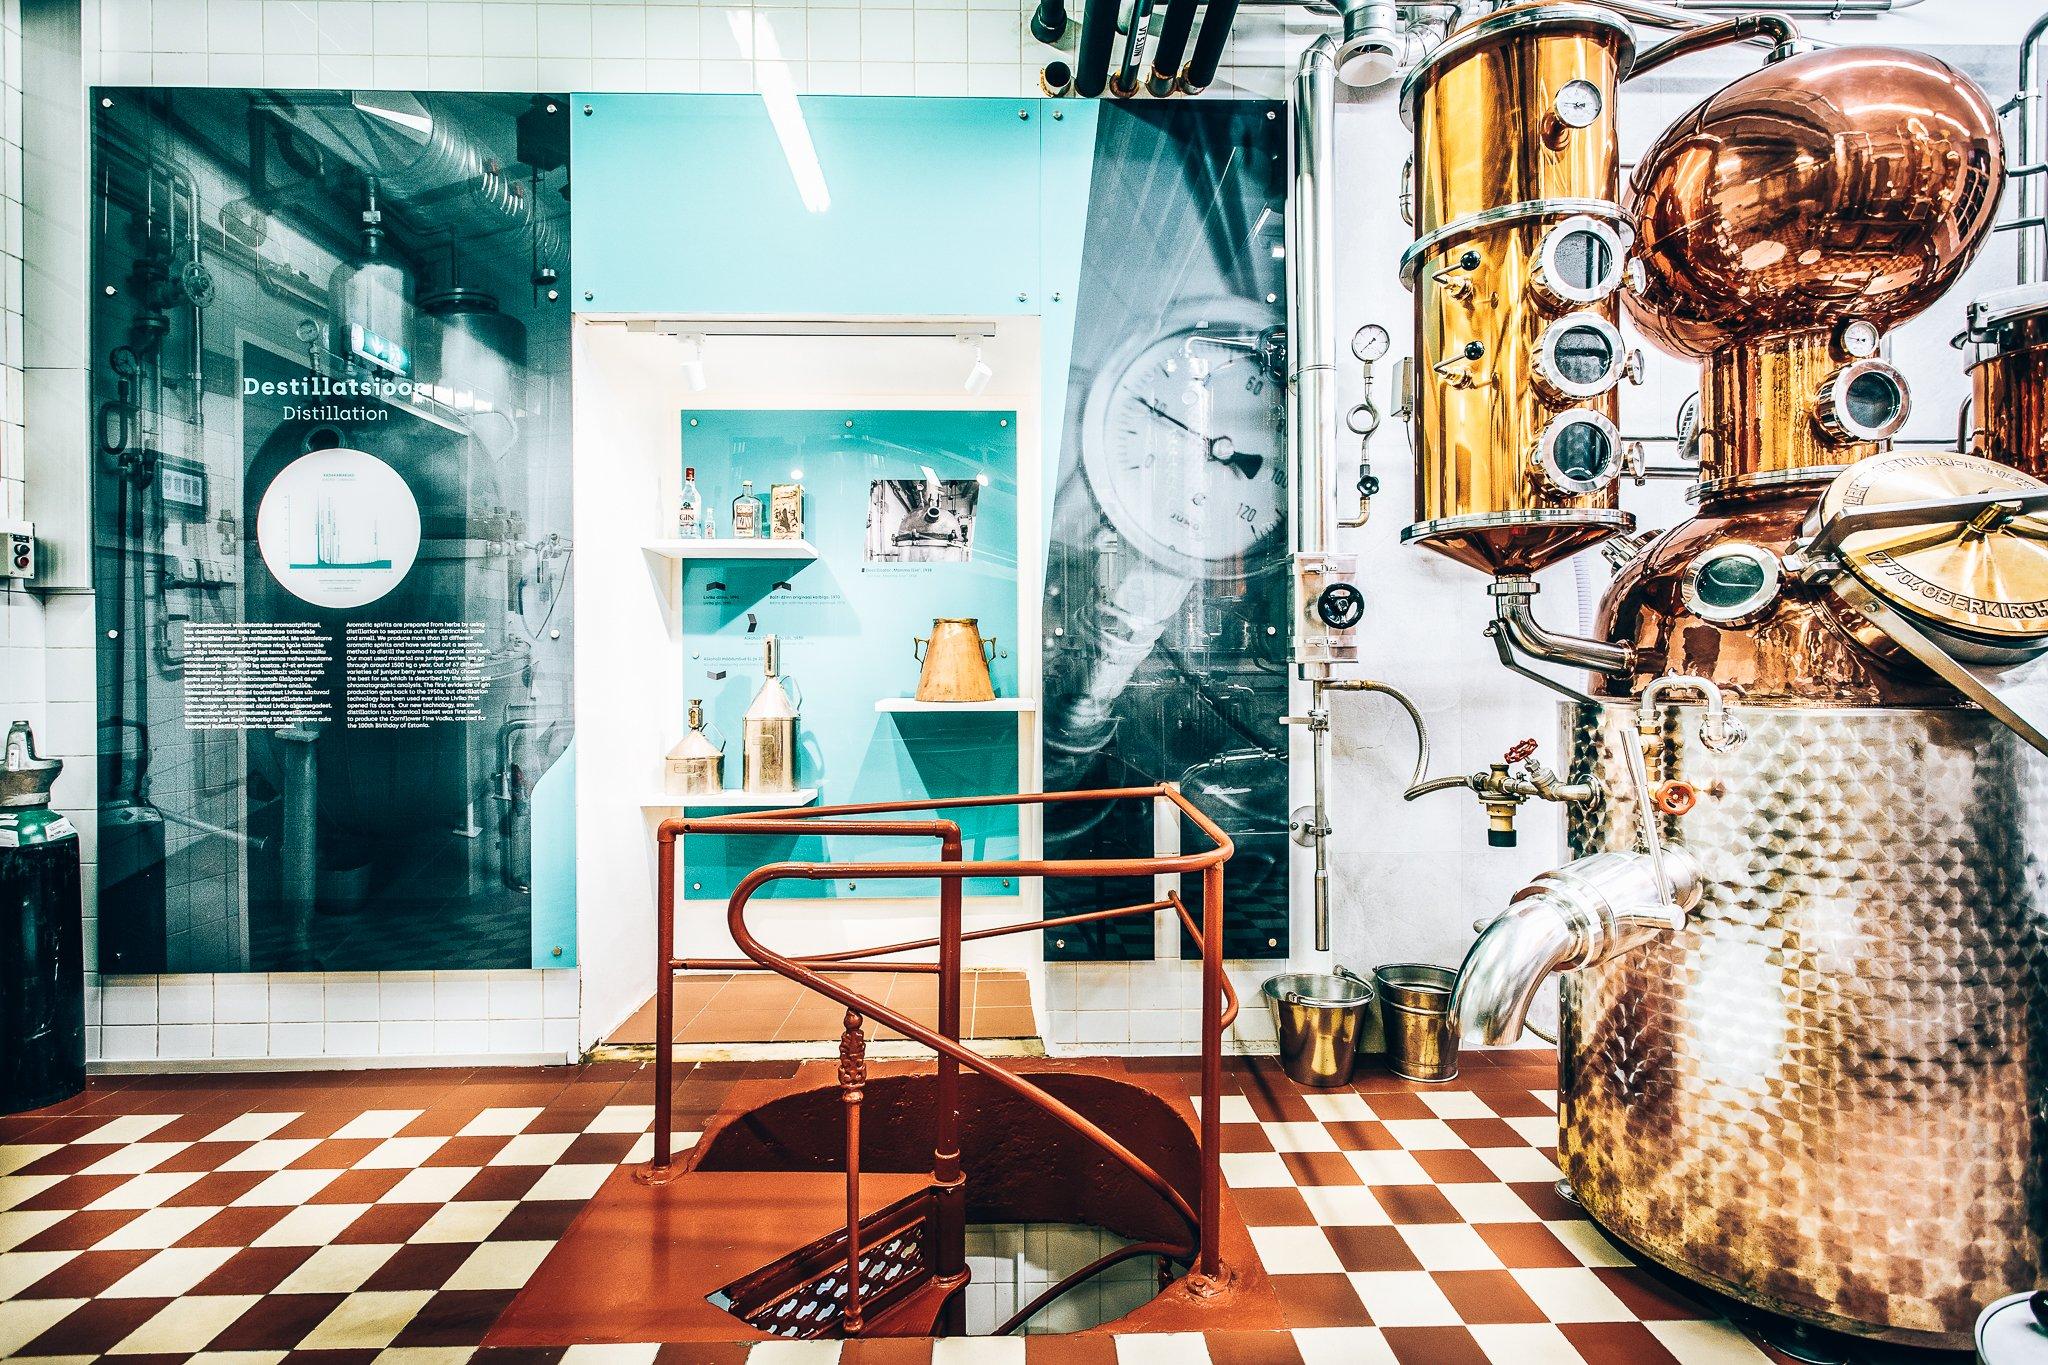 Binnenkijken bij Liviko Distillery, Estland, Crafter's Gin, Alles over gin.